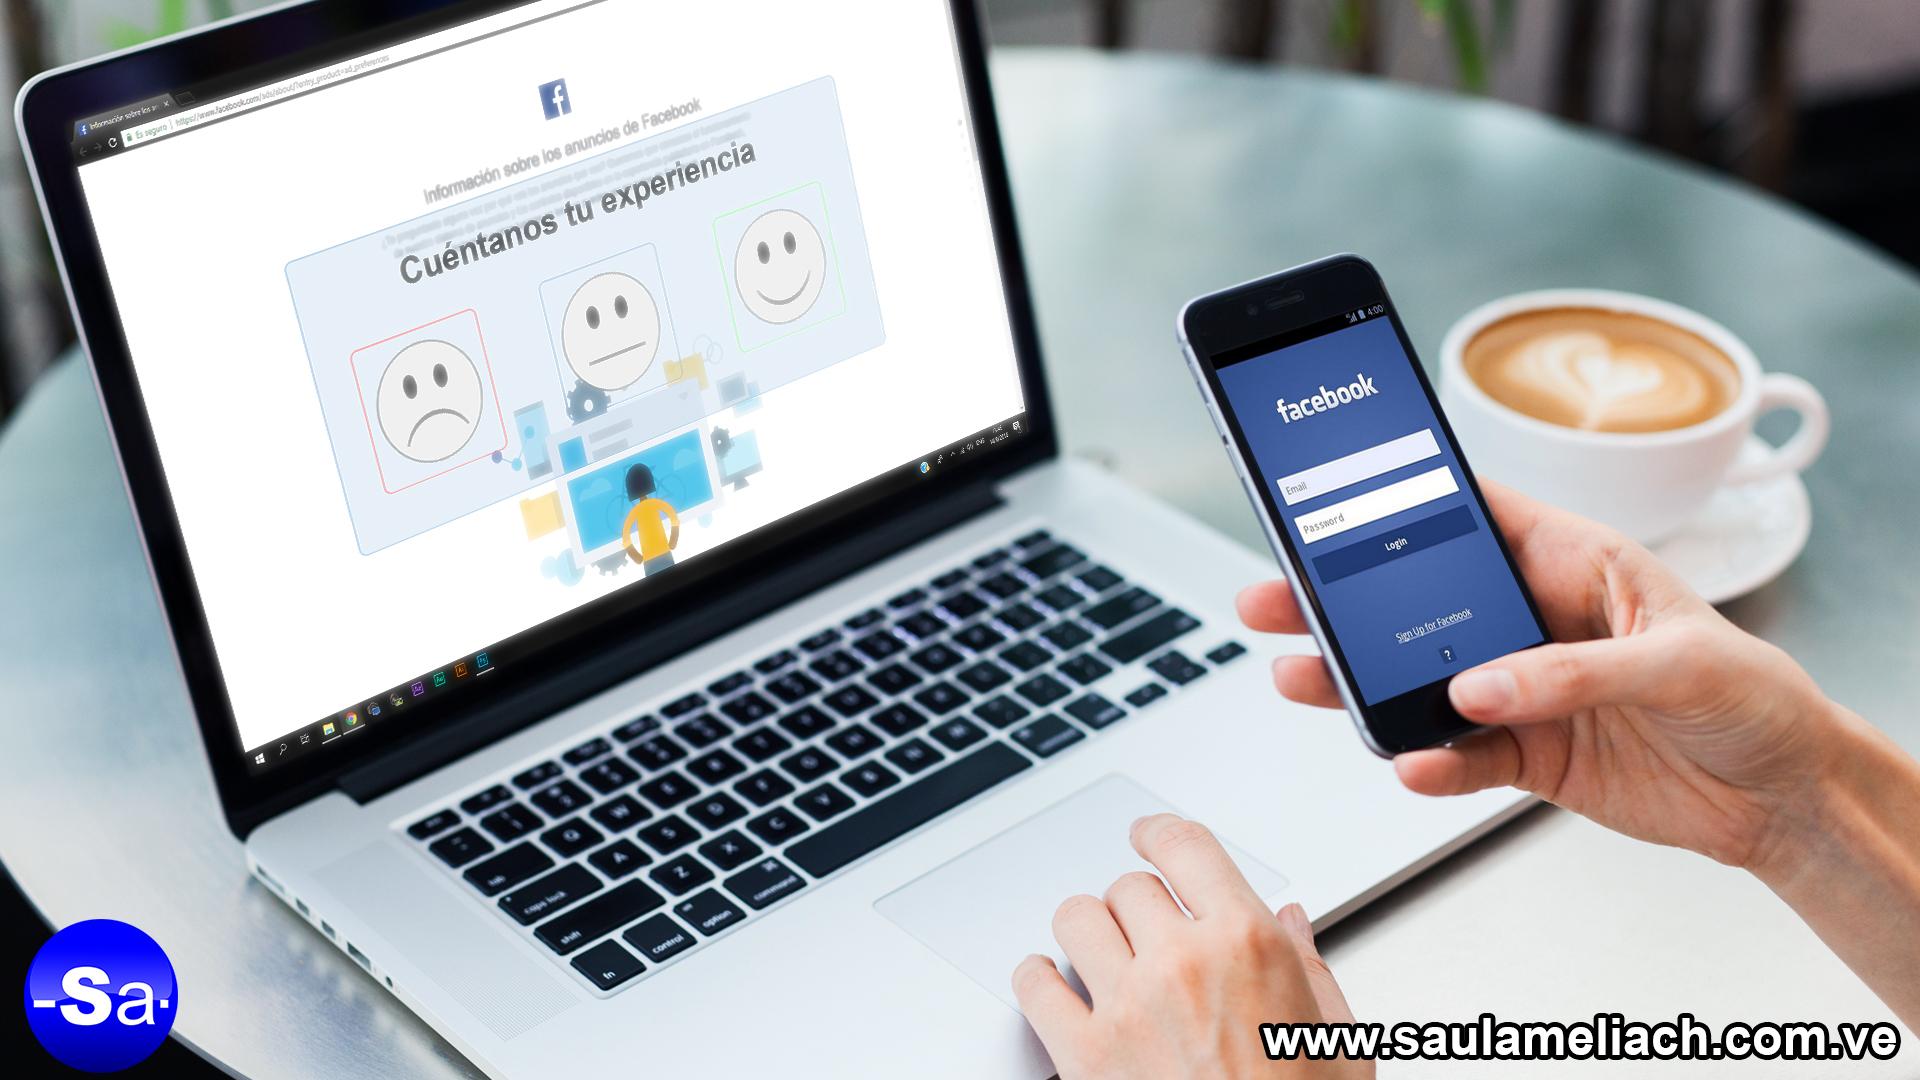 saul ameliach Facebook empresas